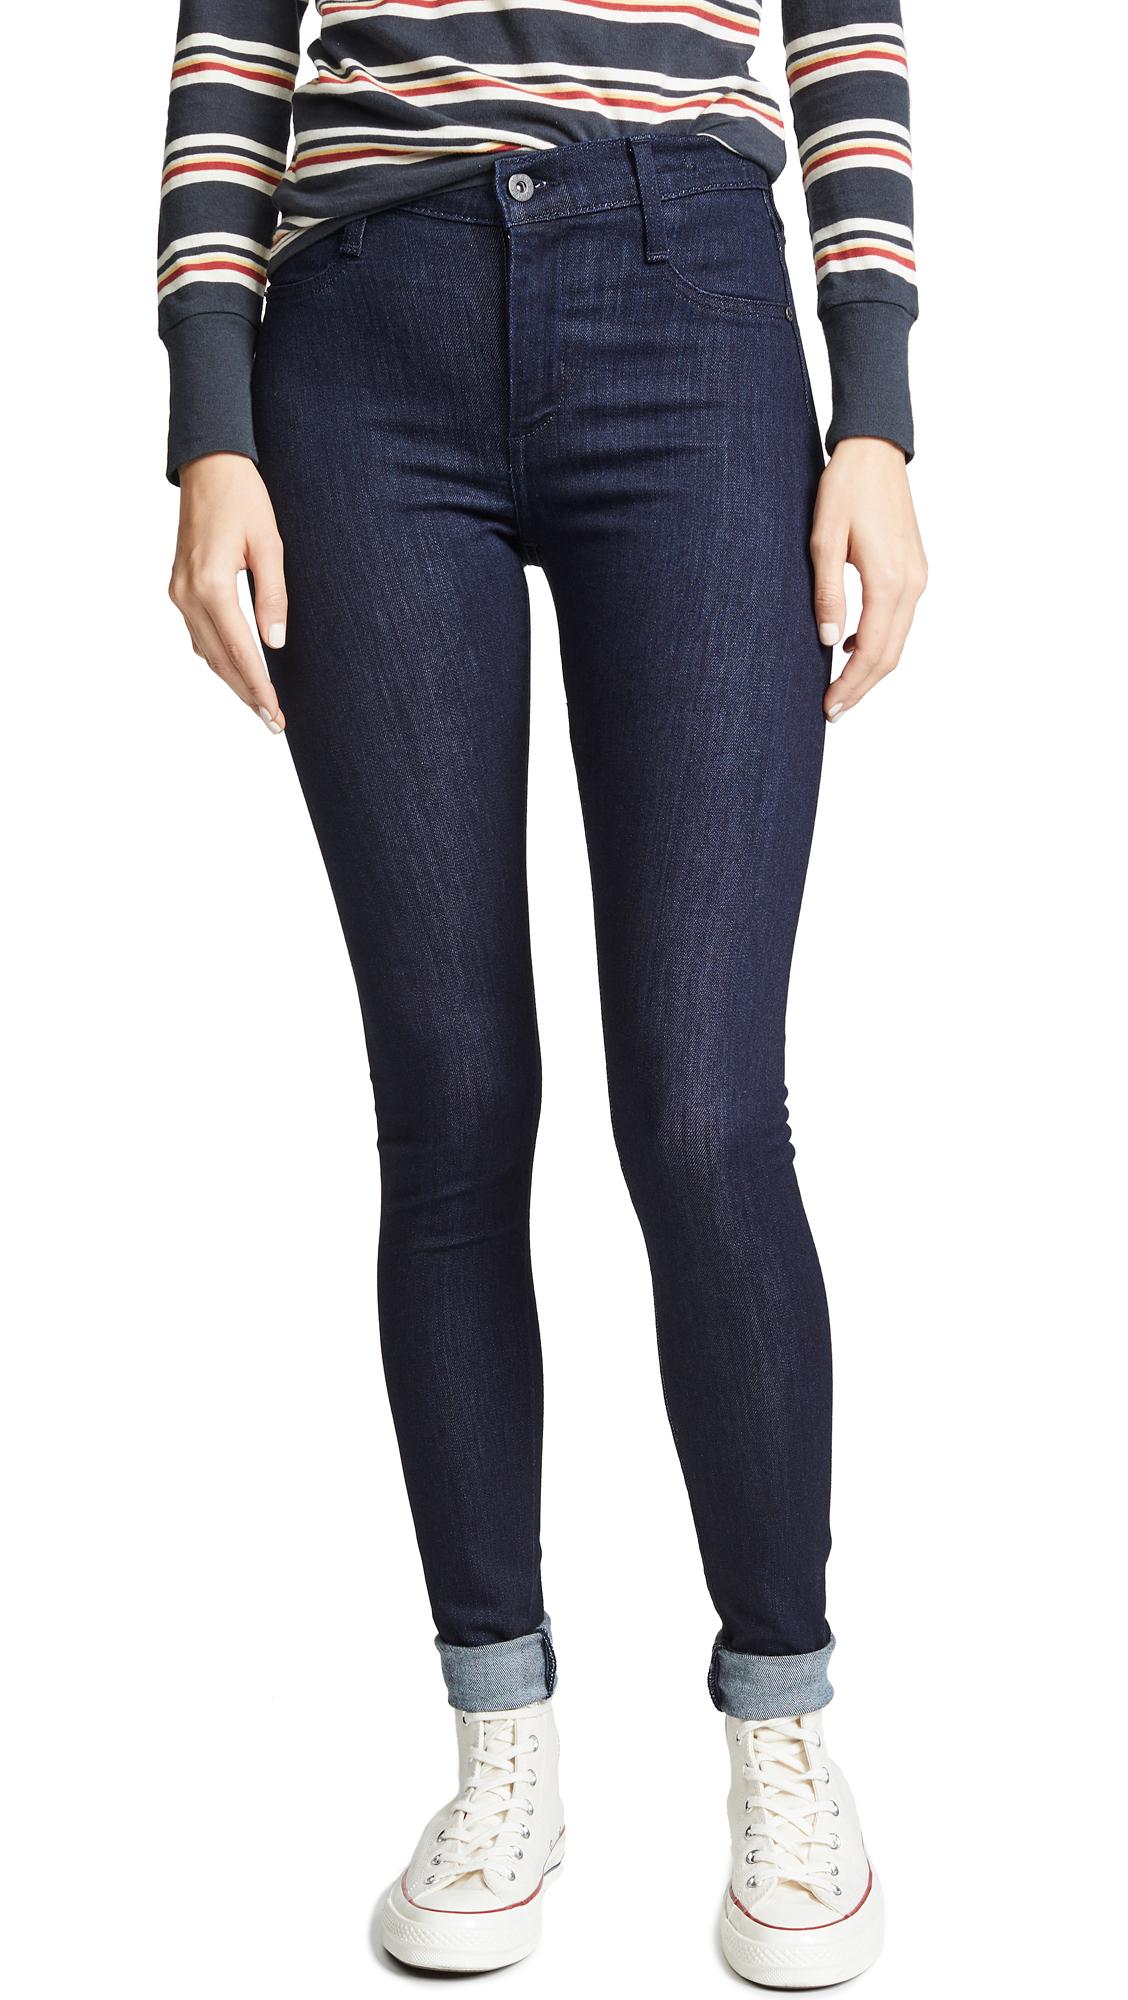 Twiggy Dancer Legging Jeans in Jive